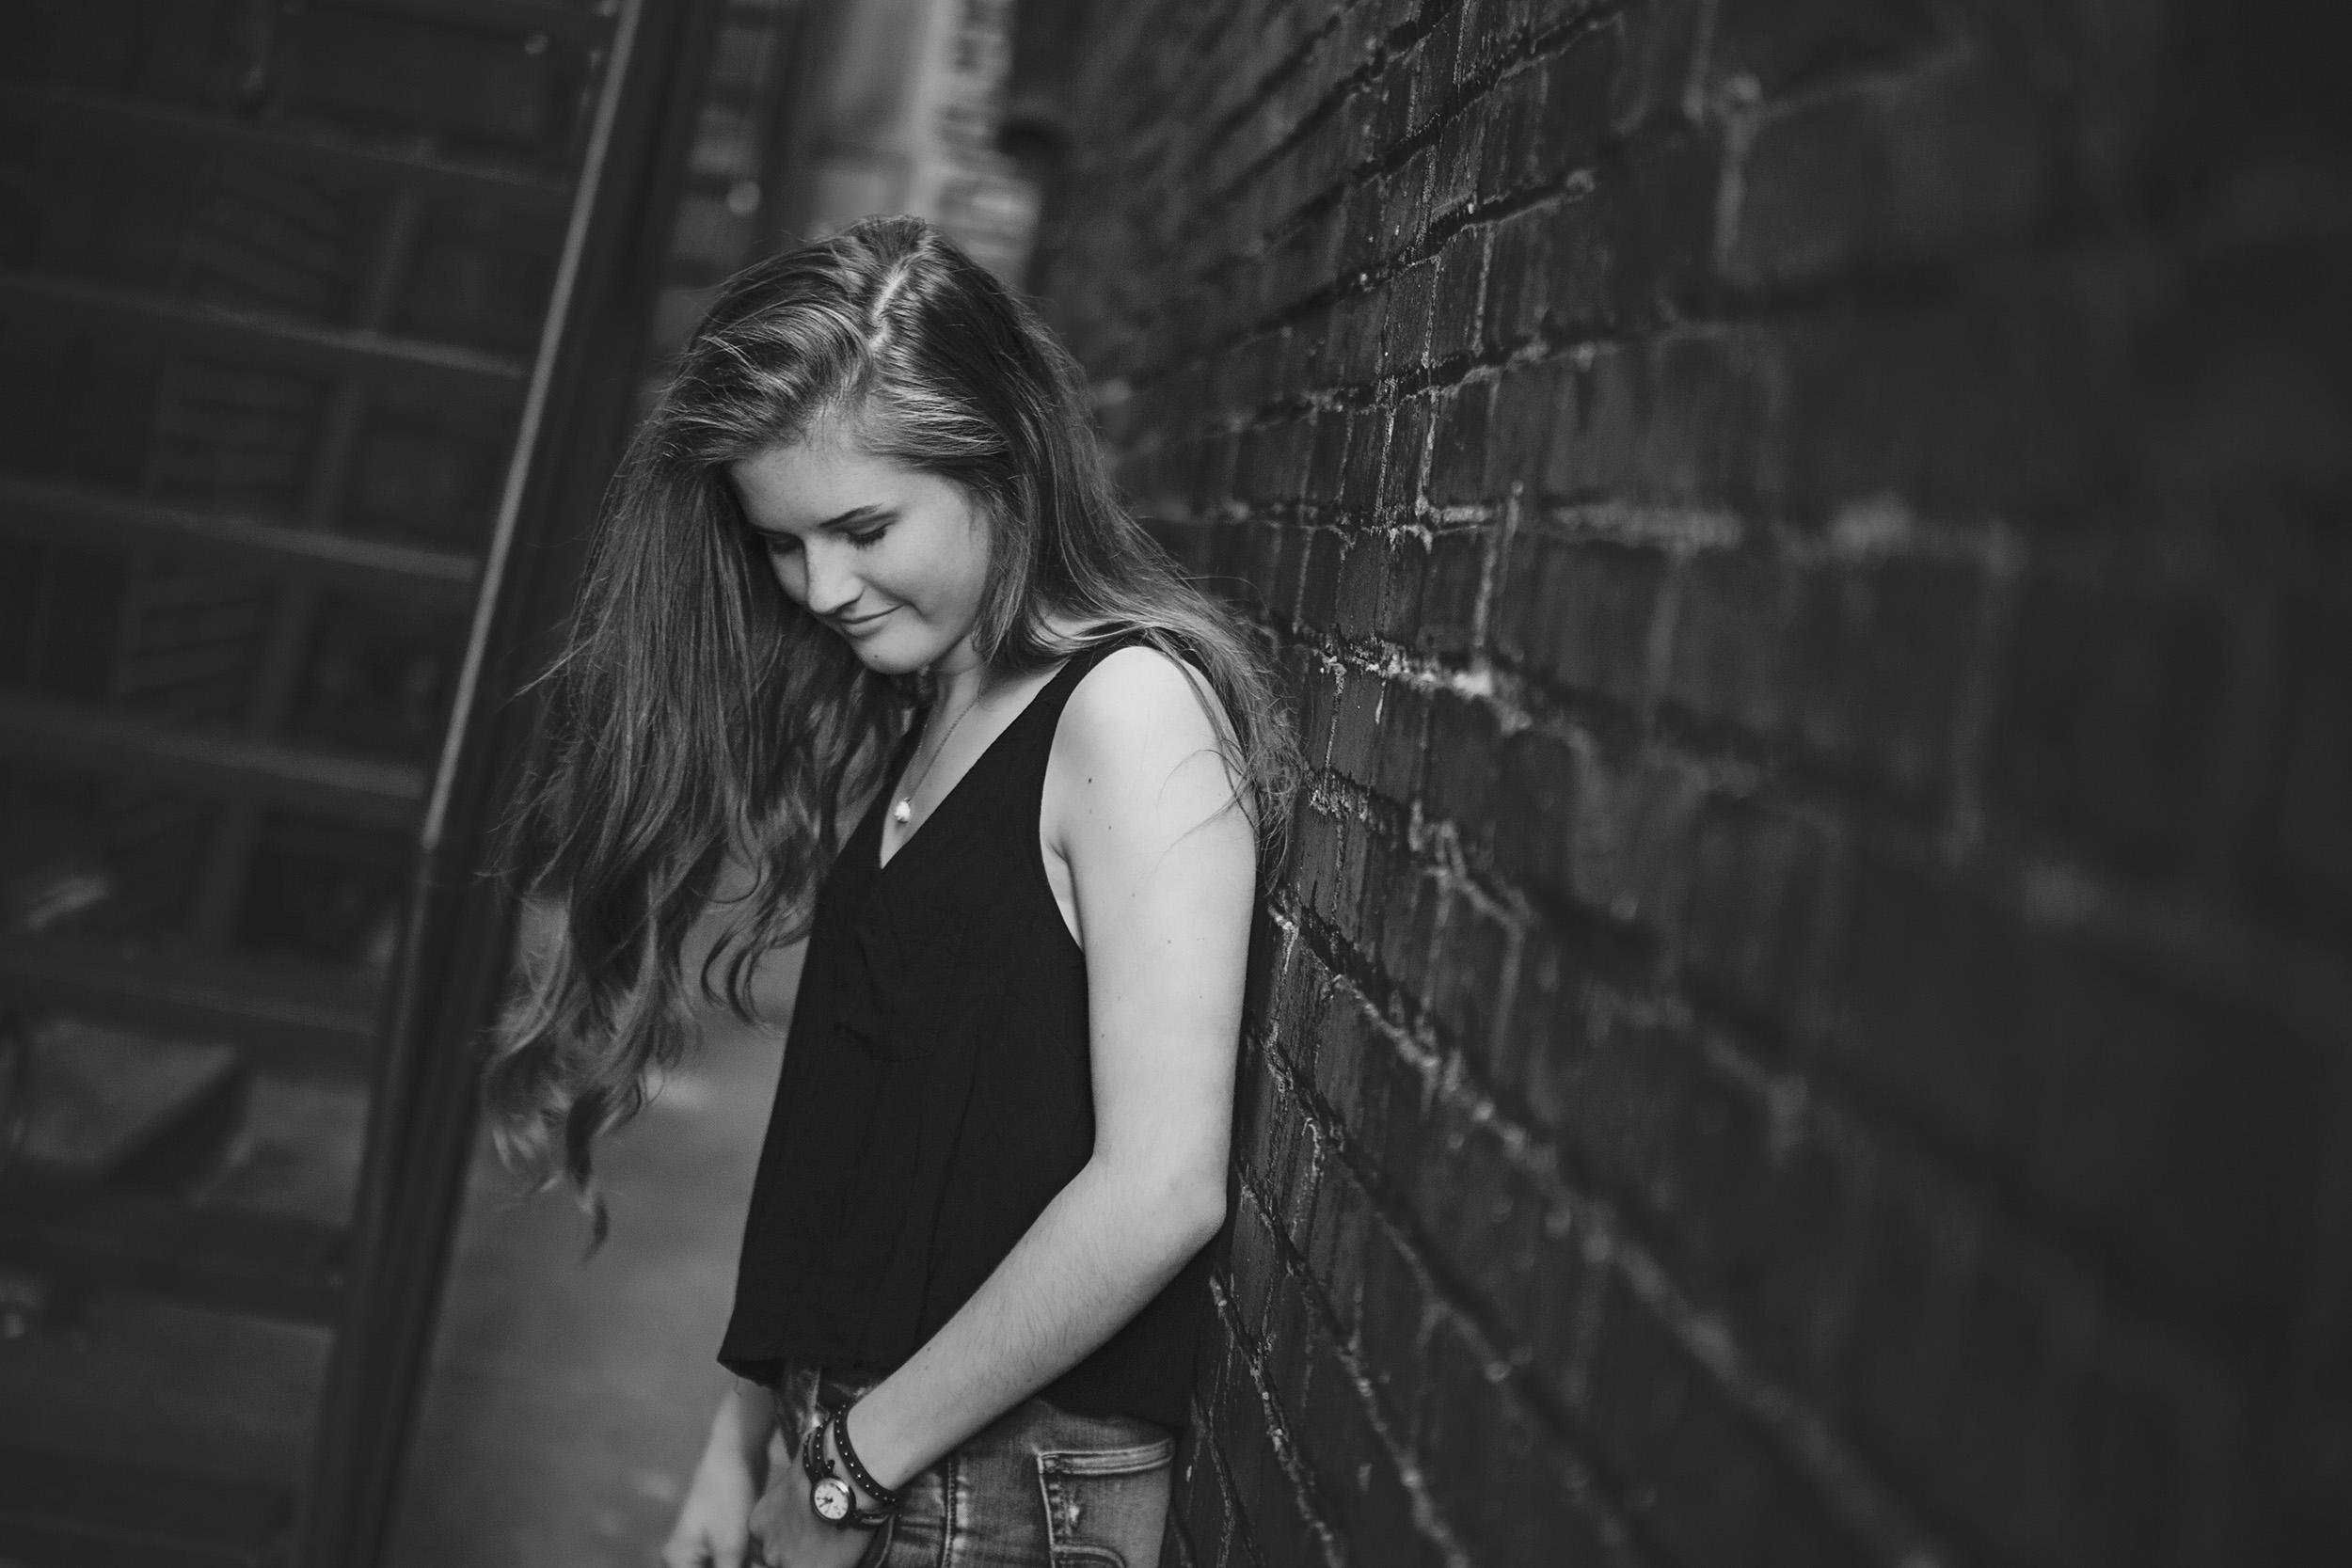 springfield-mo-senior-portrait-photography (4).jpg